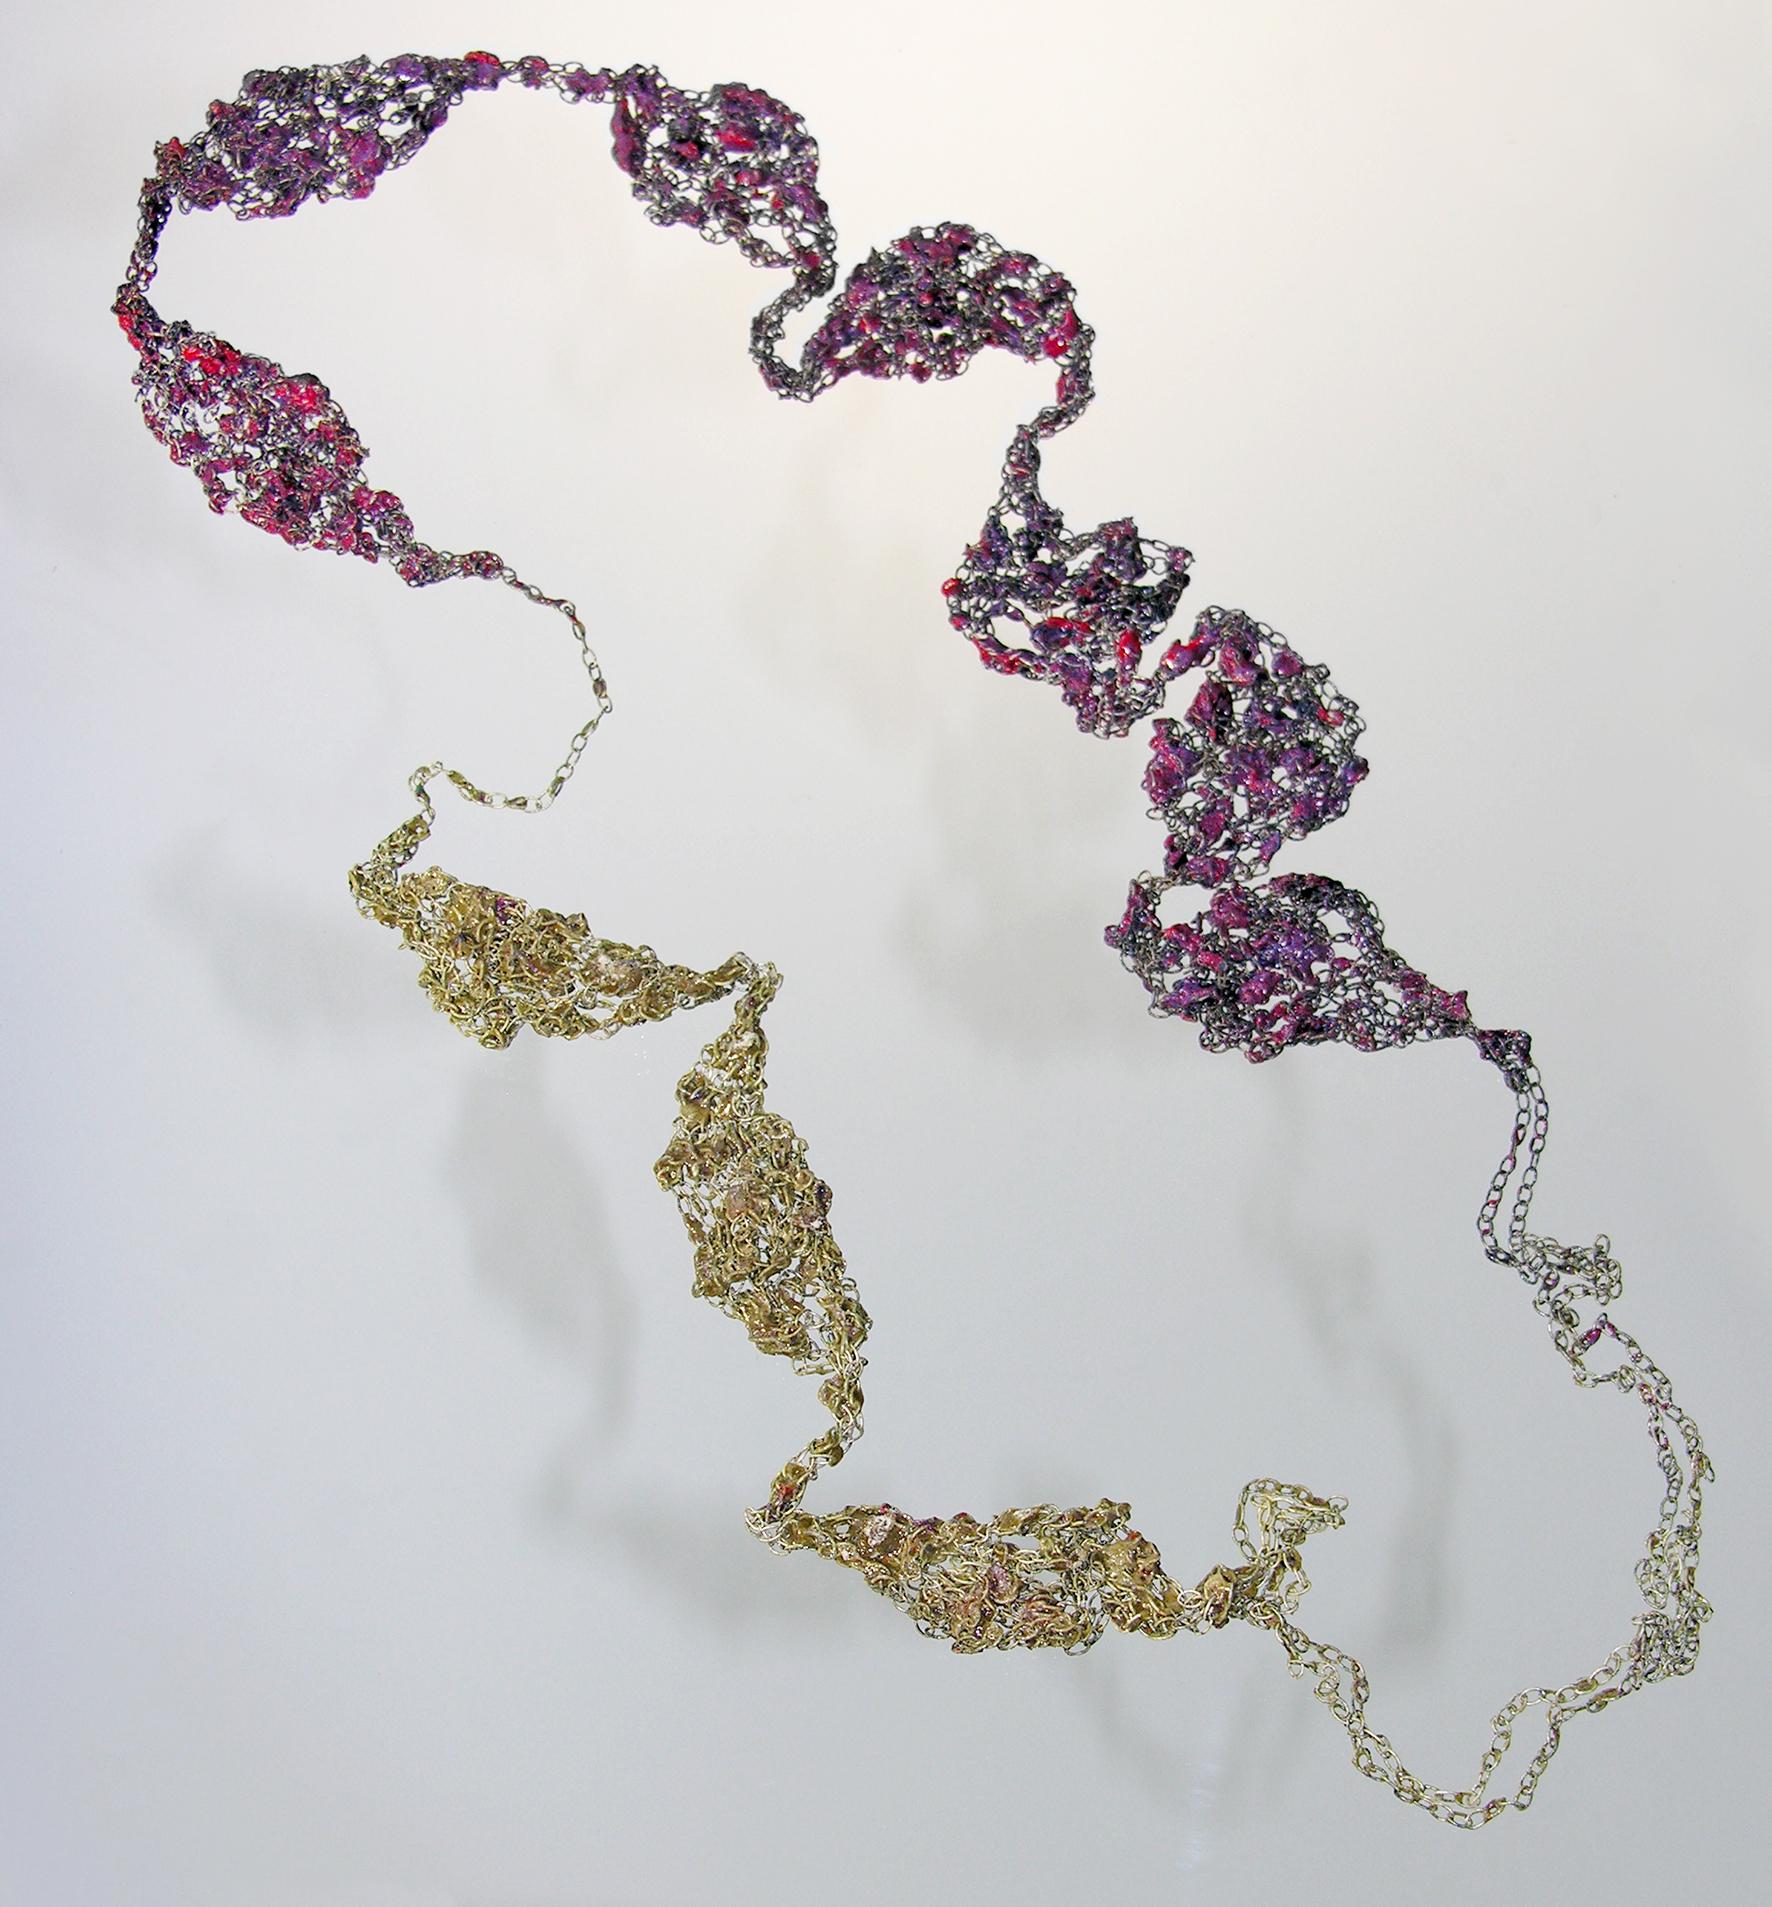 Flow-Fileri necklace 2014-Liana Pattihis